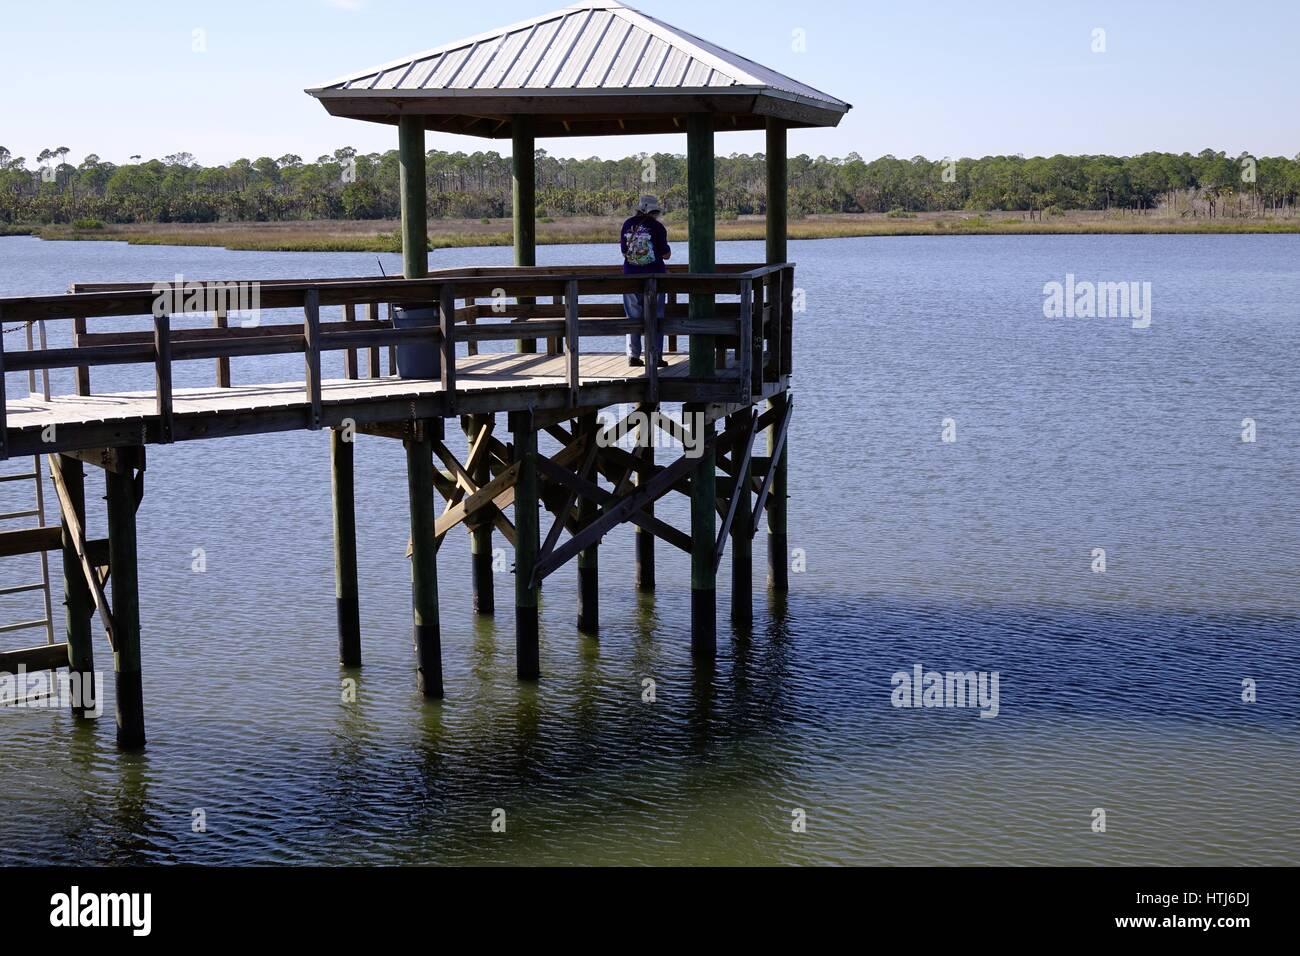 Fishing dock at Spruce Creek Park, Port Orange, Volusia County, Florida - Stock Image